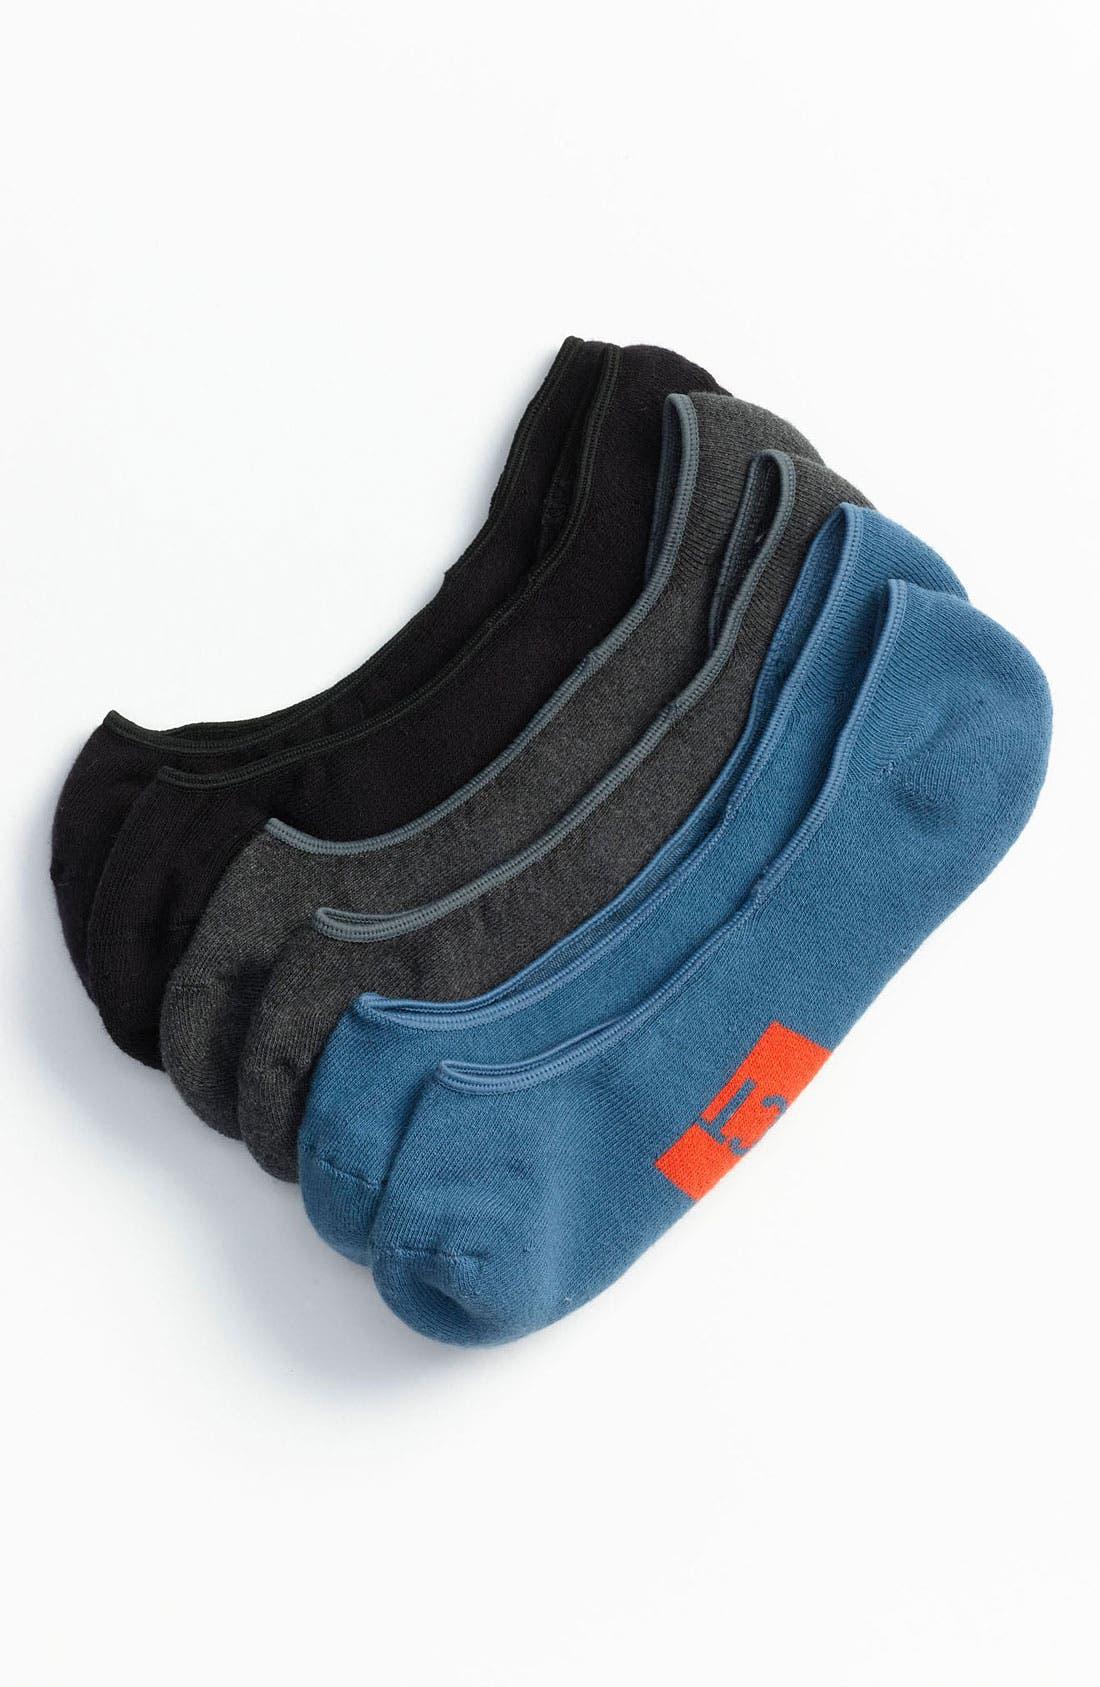 Main Image - Pact No-Show Socks (3-Pack) (Men)